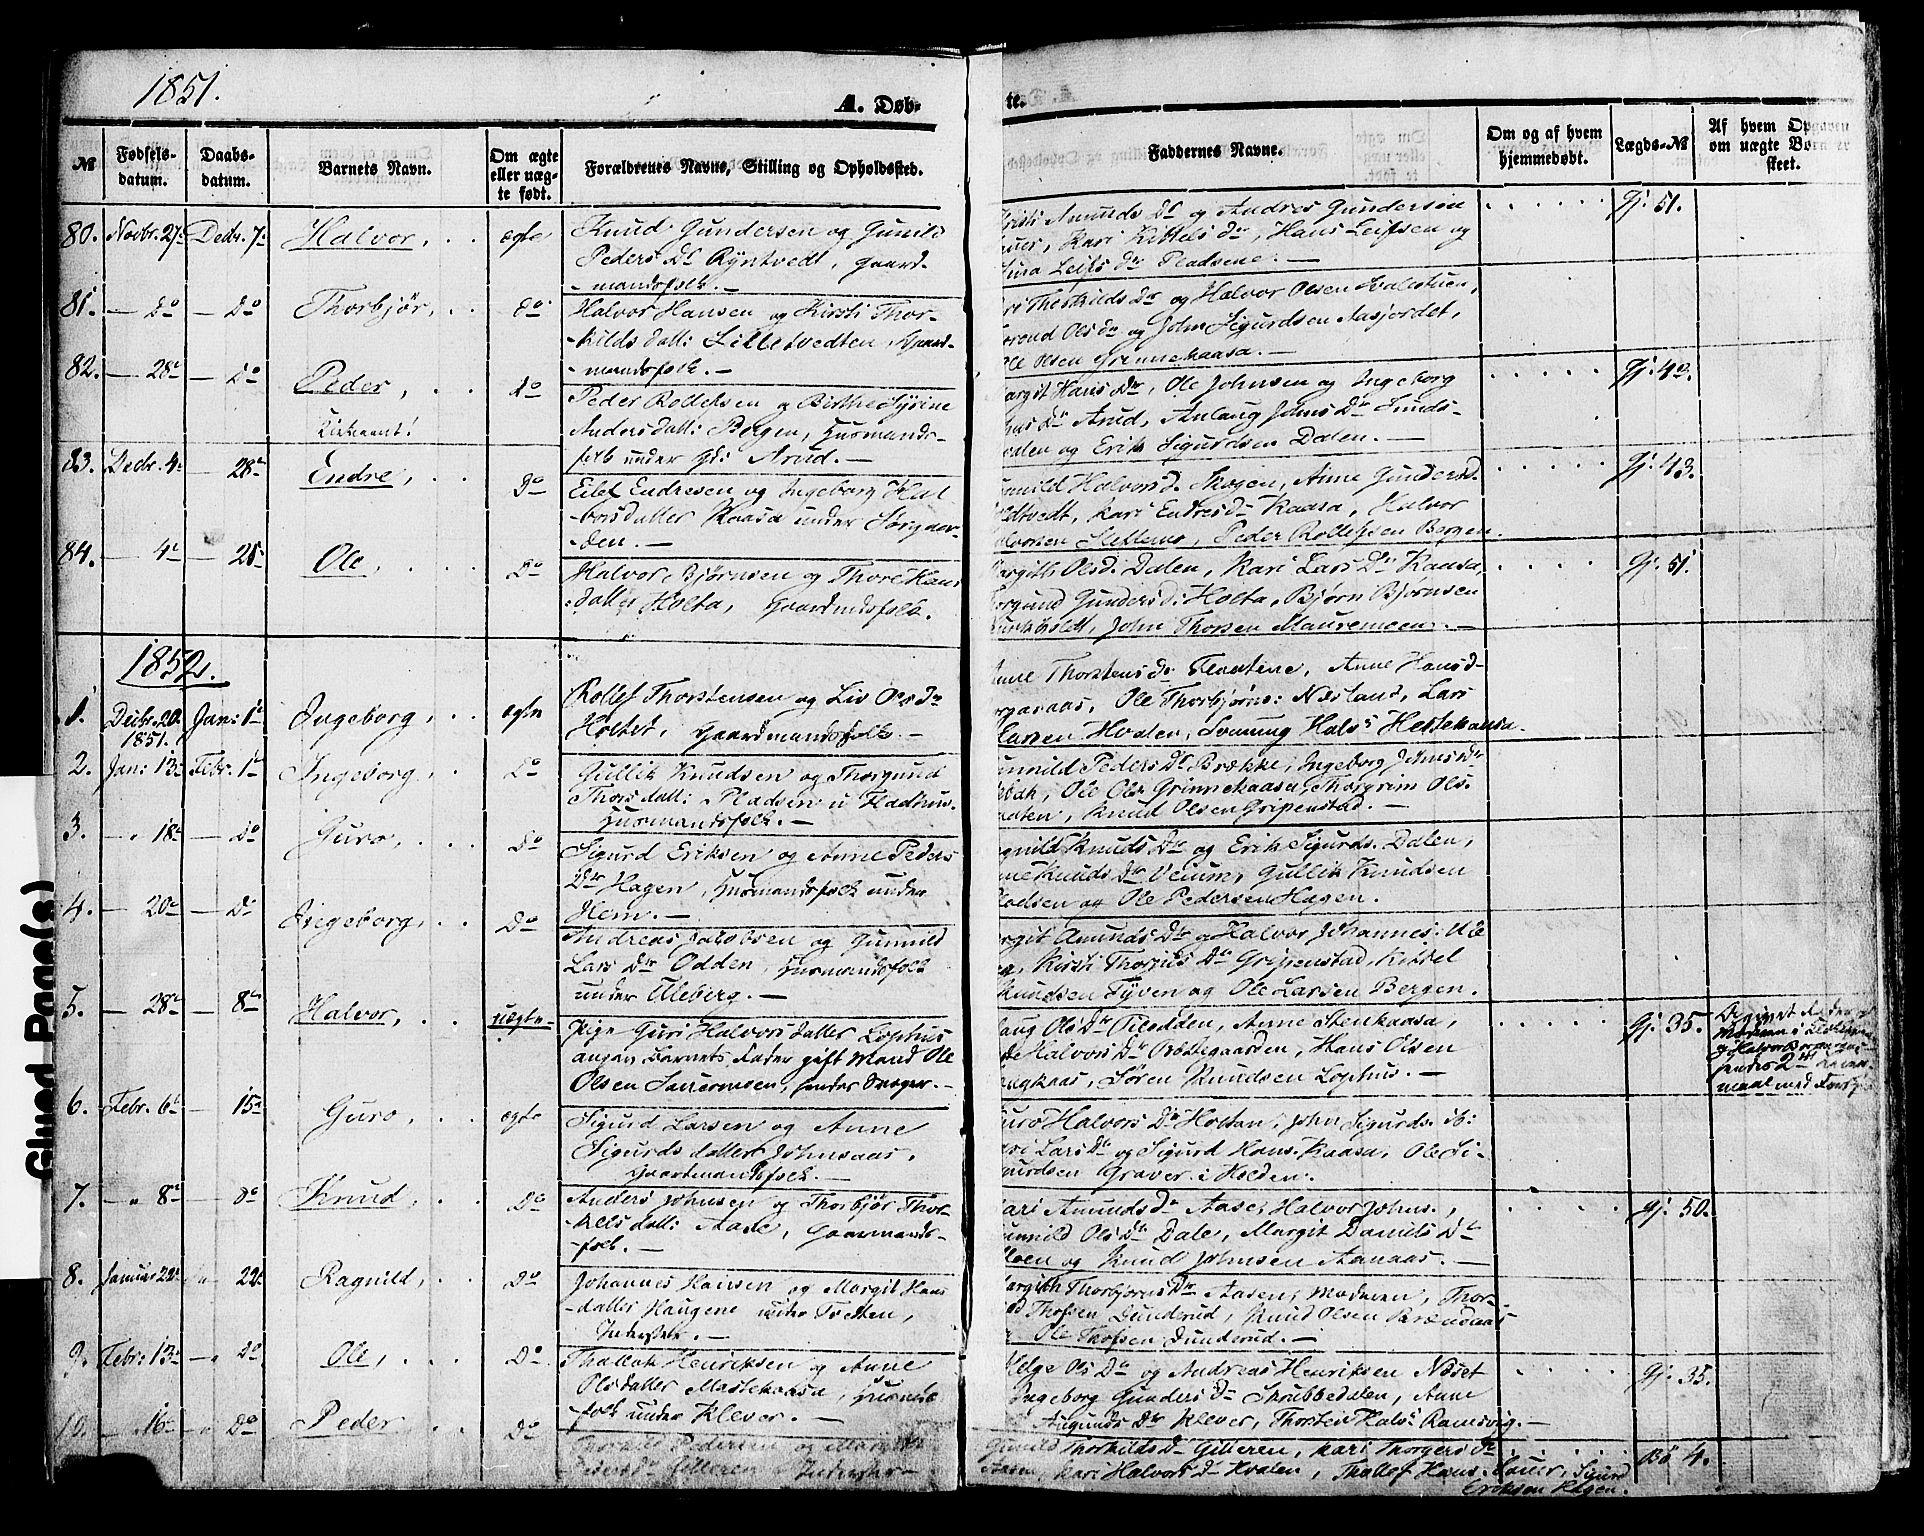 SAKO, Sauherad kirkebøker, F/Fa/L0007: Ministerialbok nr. I 7, 1851-1873, s. 6